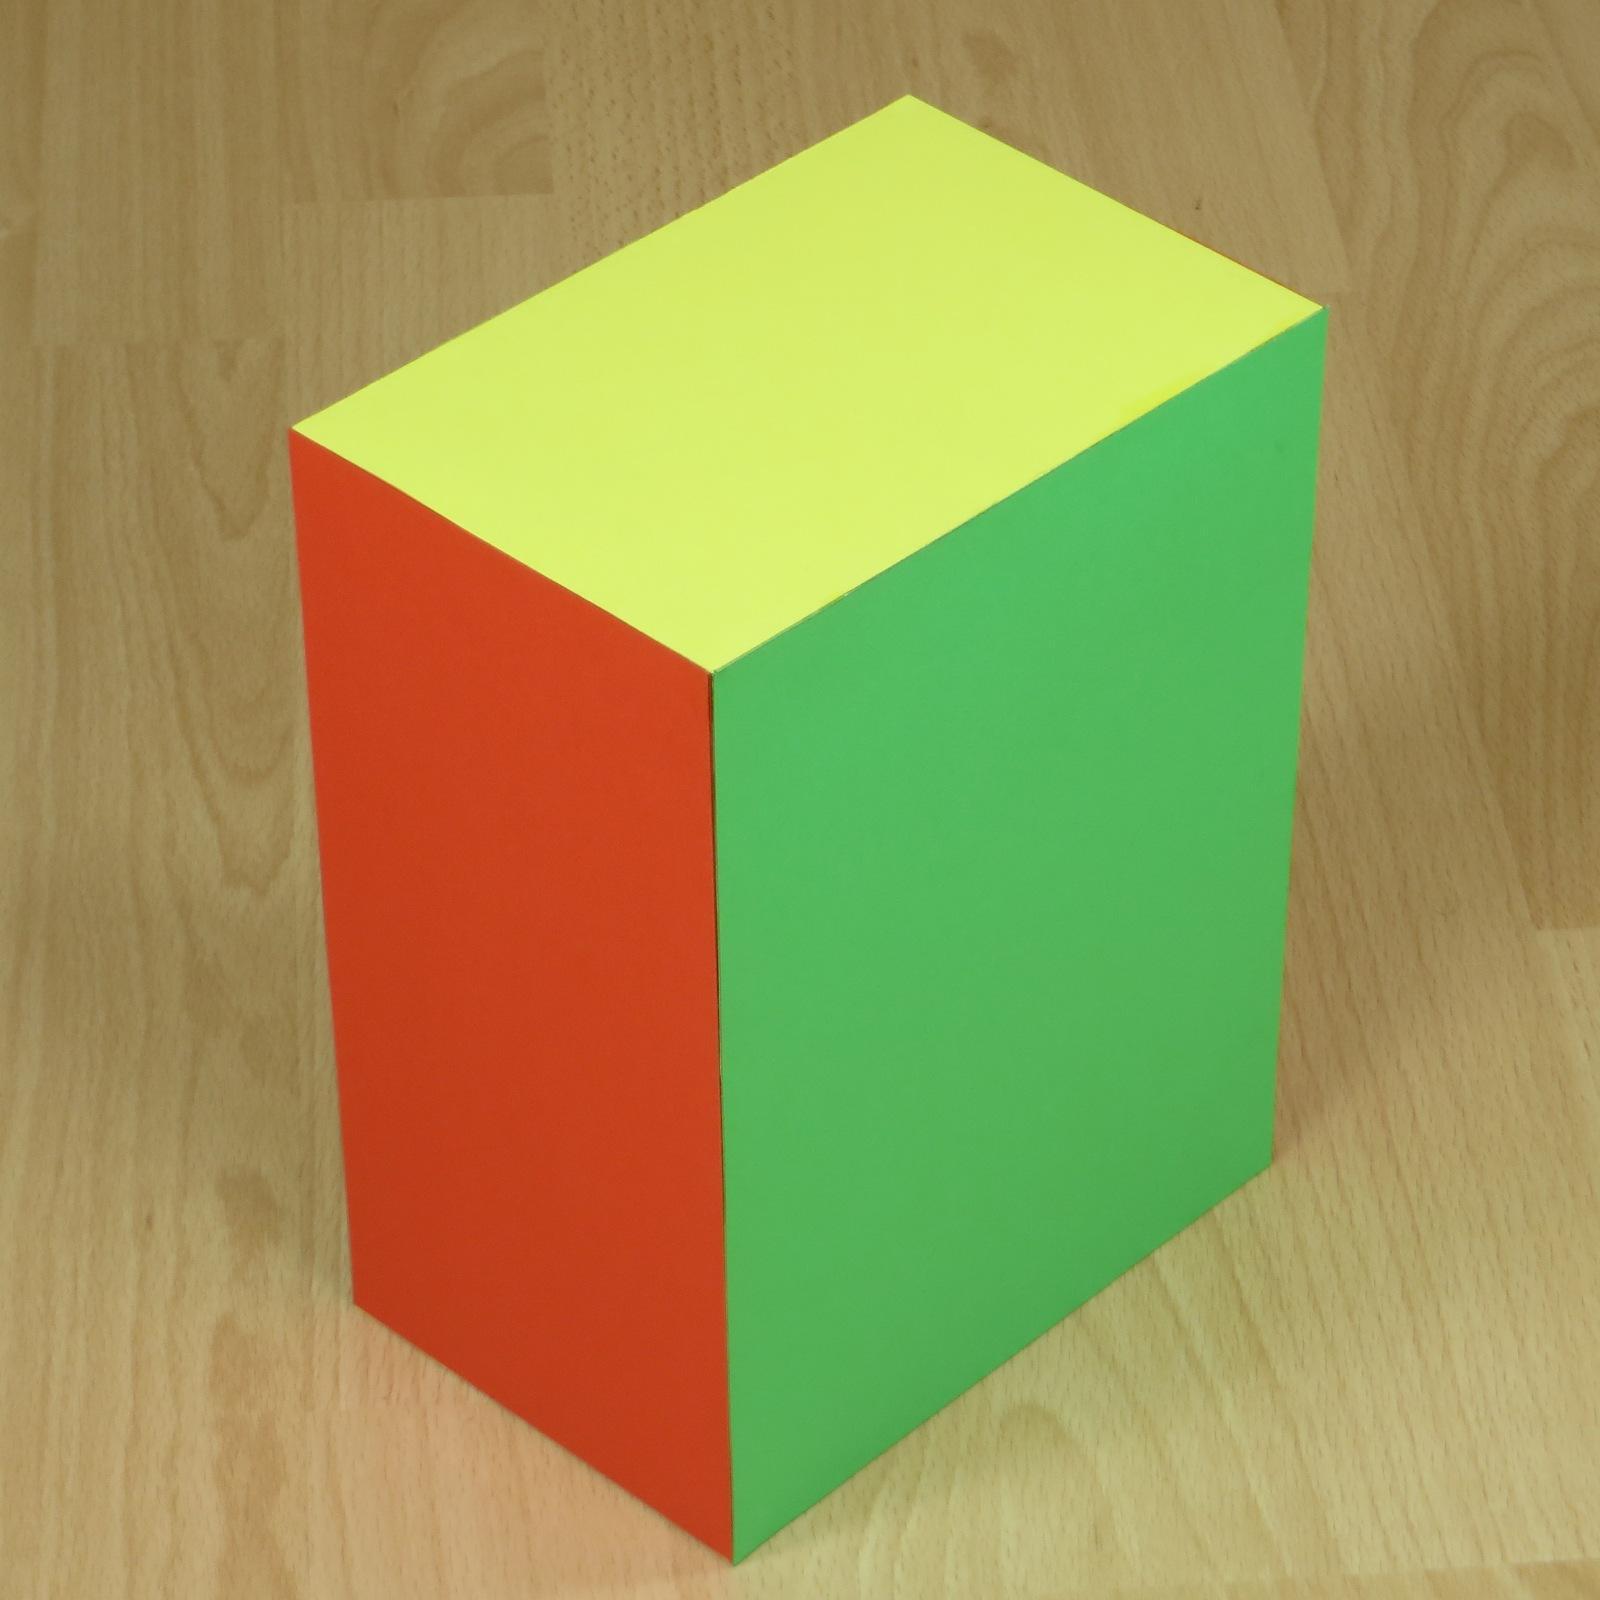 Cereal clipart rectangular prism Prism (cuboid) Paper  prism